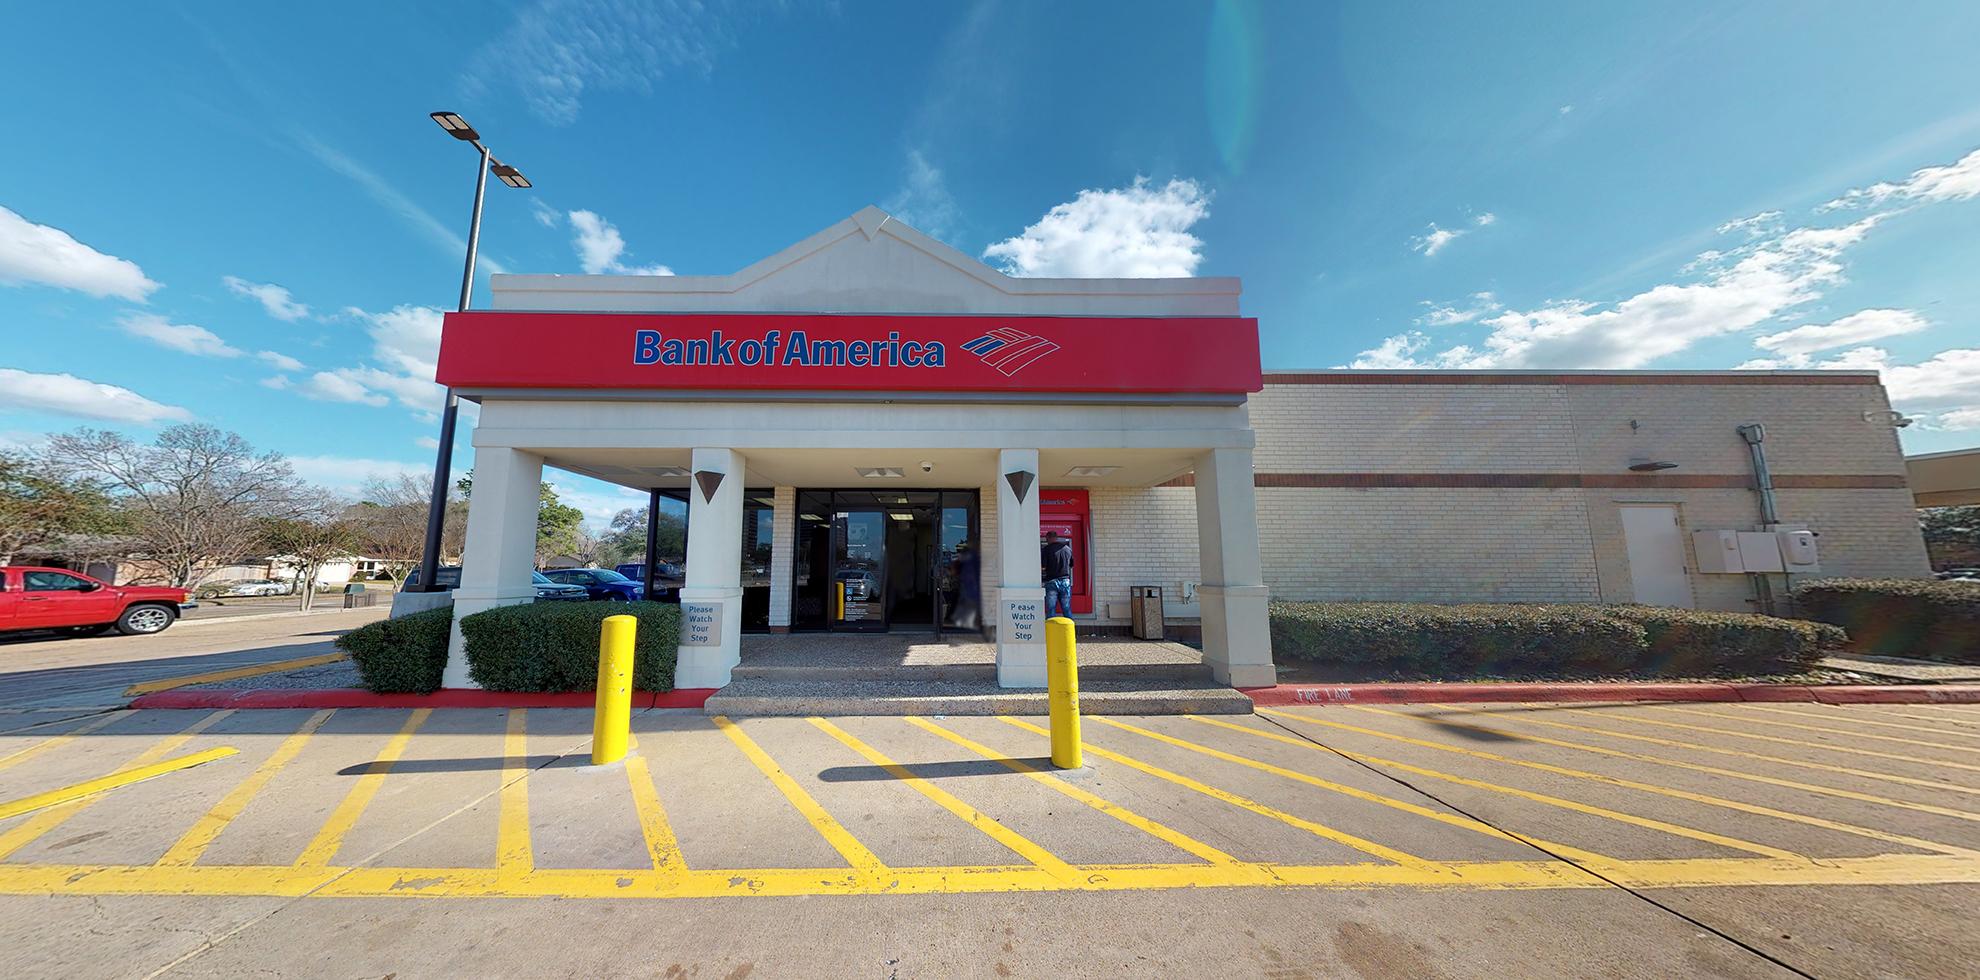 Bank of America financial center with drive-thru ATM | 7500 Fondren Rd, Houston, TX 77074